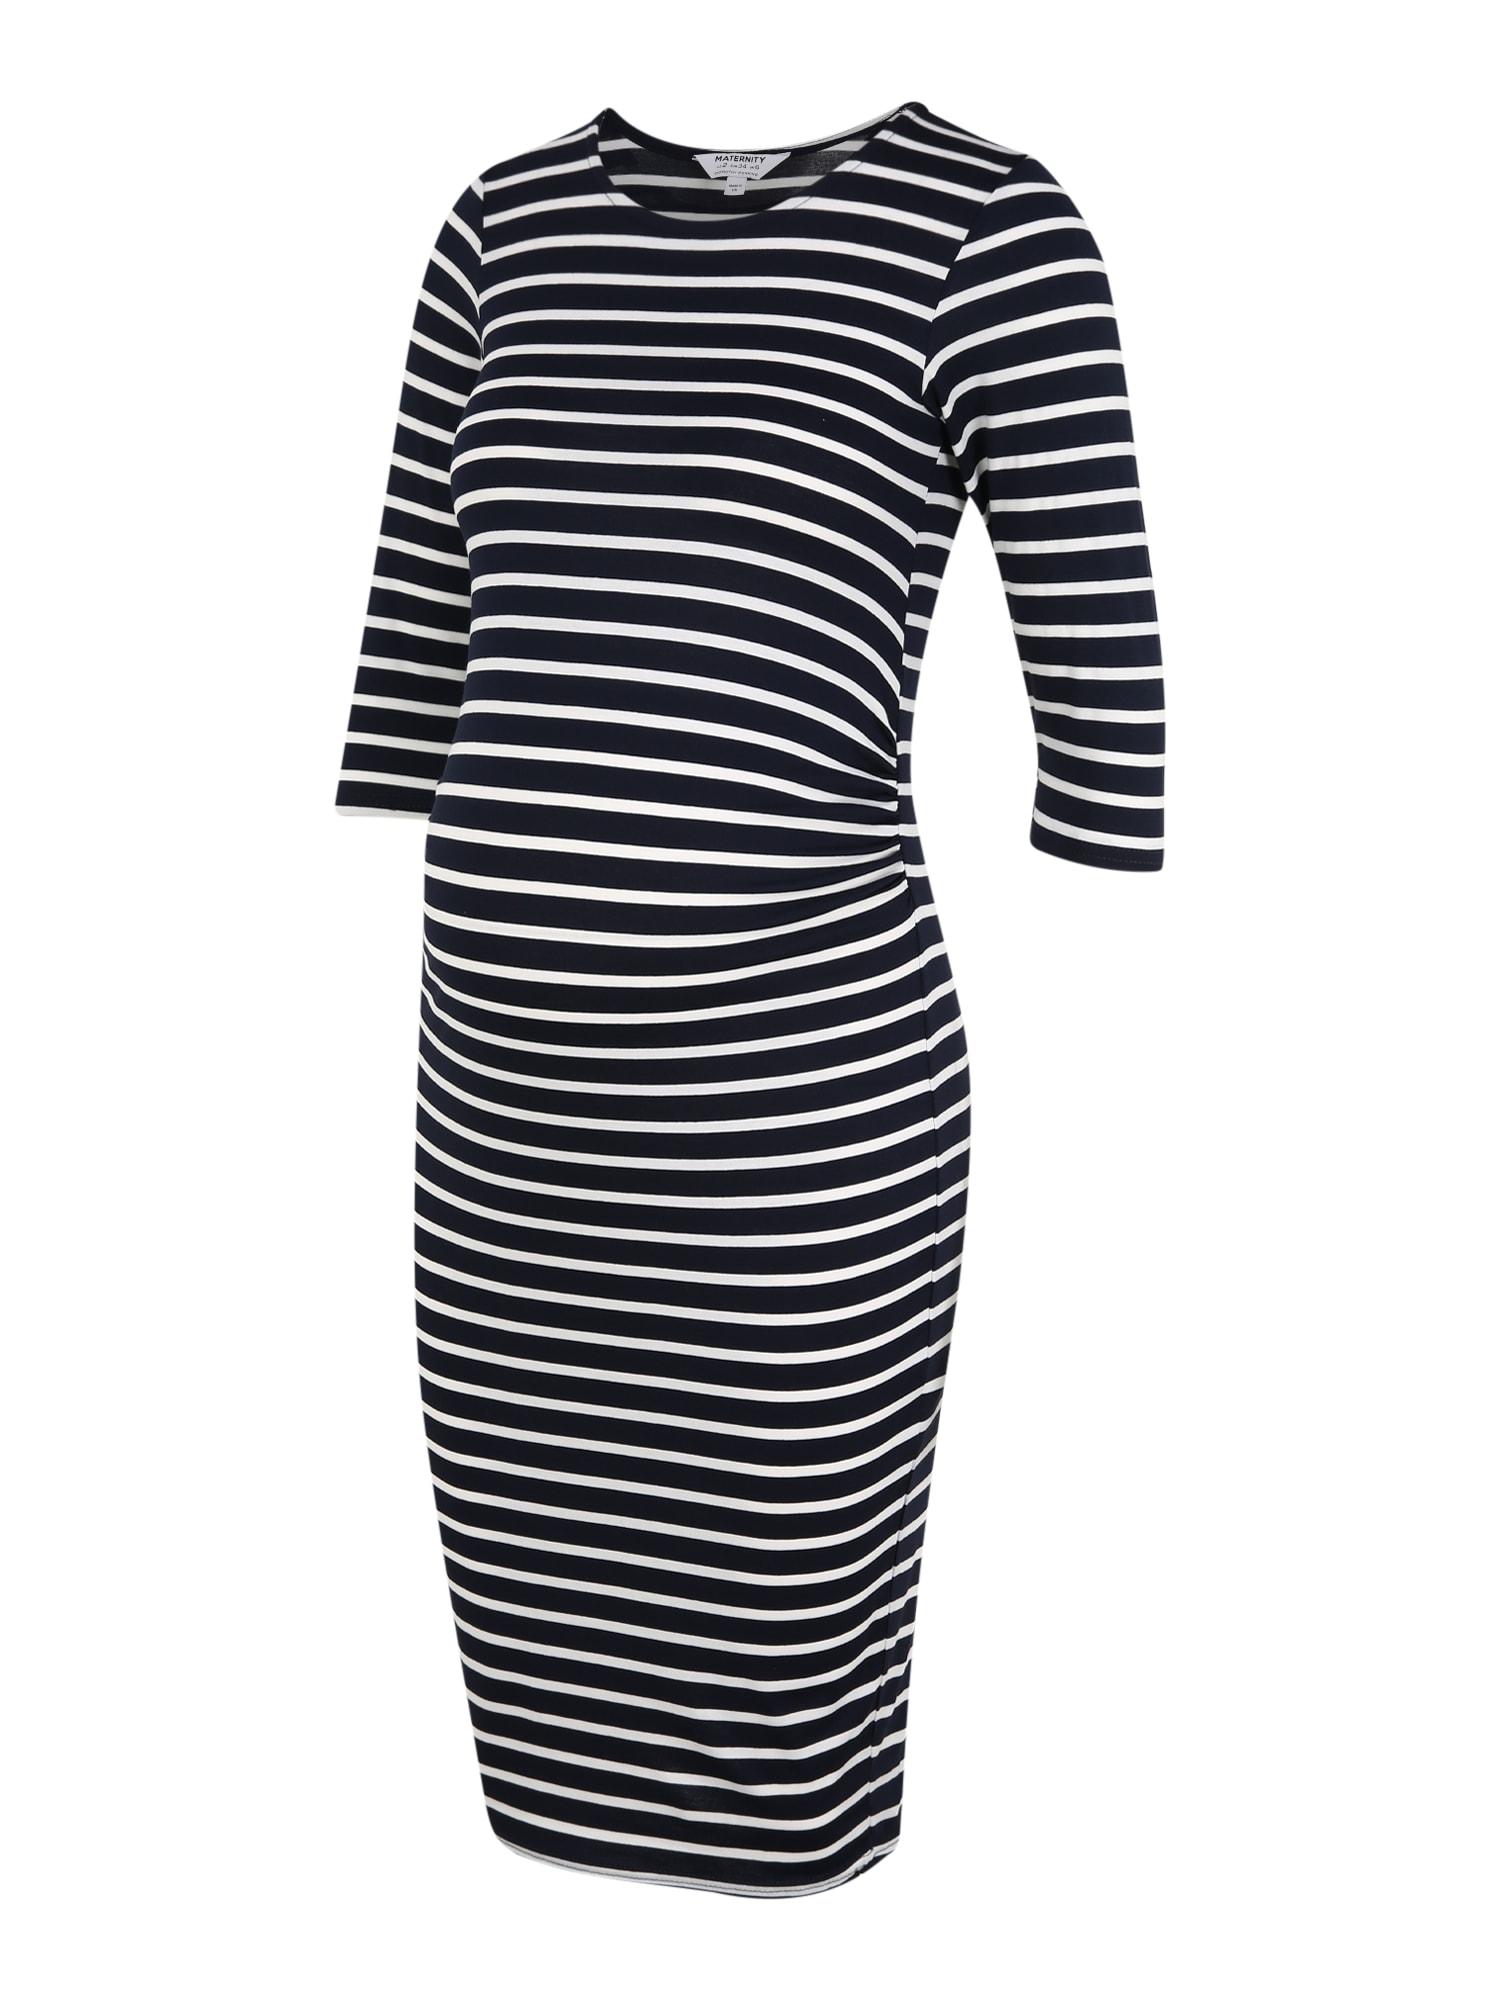 Dorothy Perkins Maternity Suknelė tamsiai mėlyna / balta